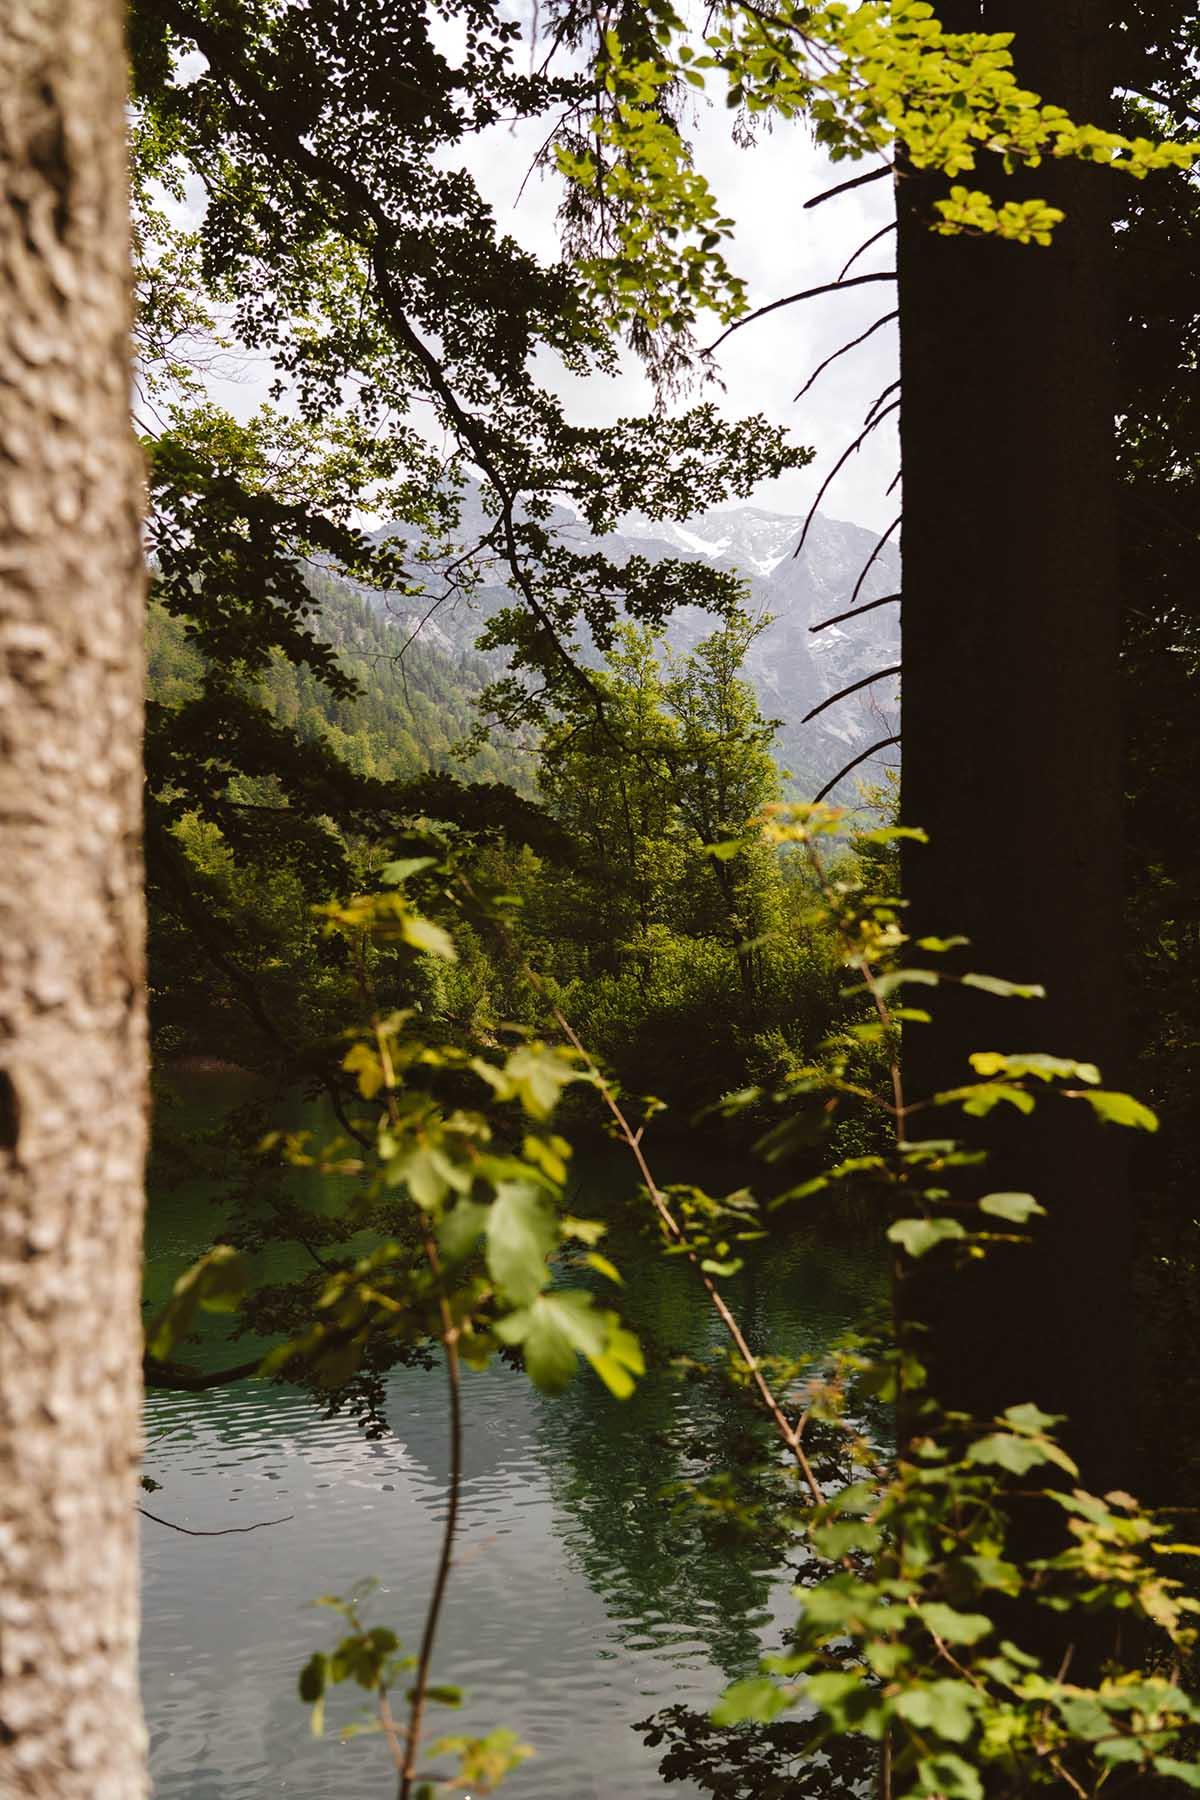 schoenste-badeseen-oesterreich-oedseen-wald-berg